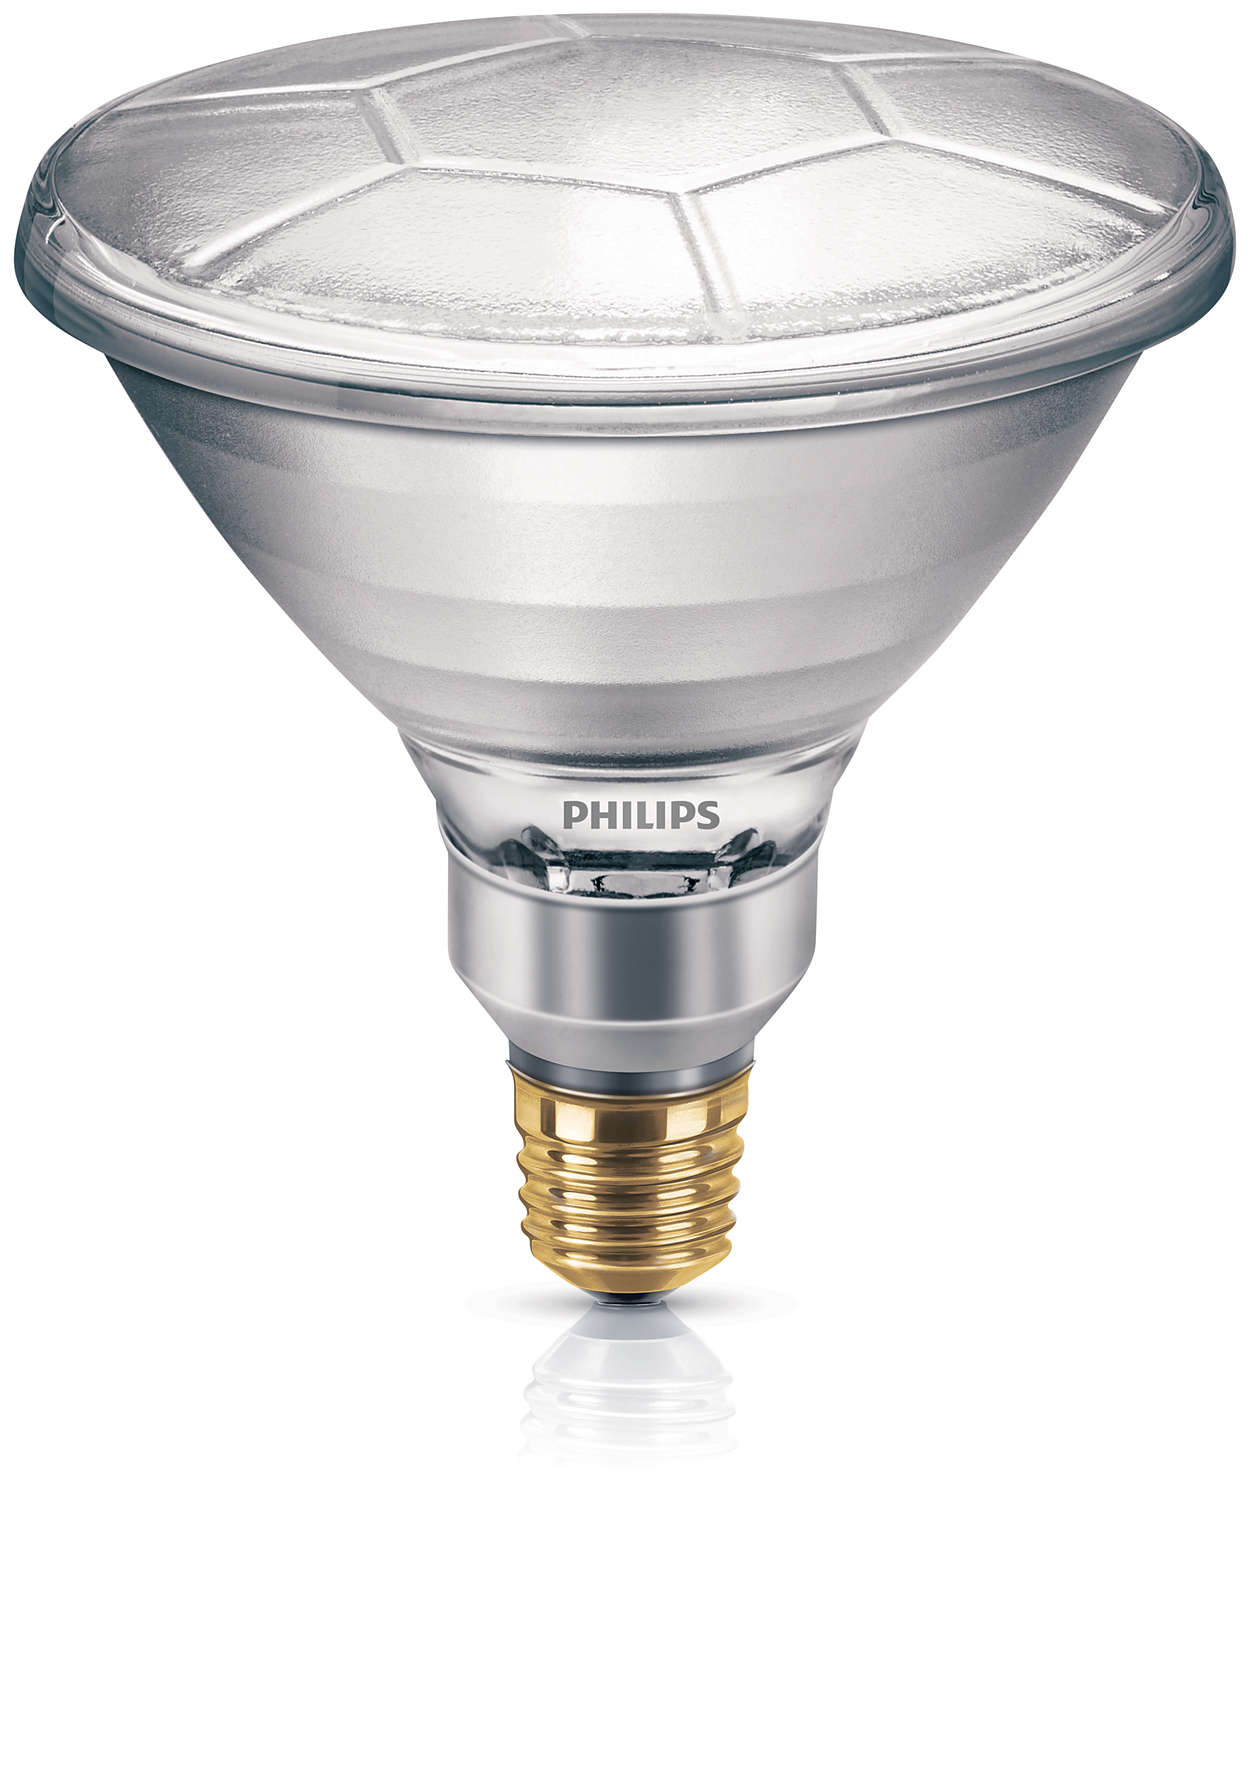 Tehokas heijastinlamppu